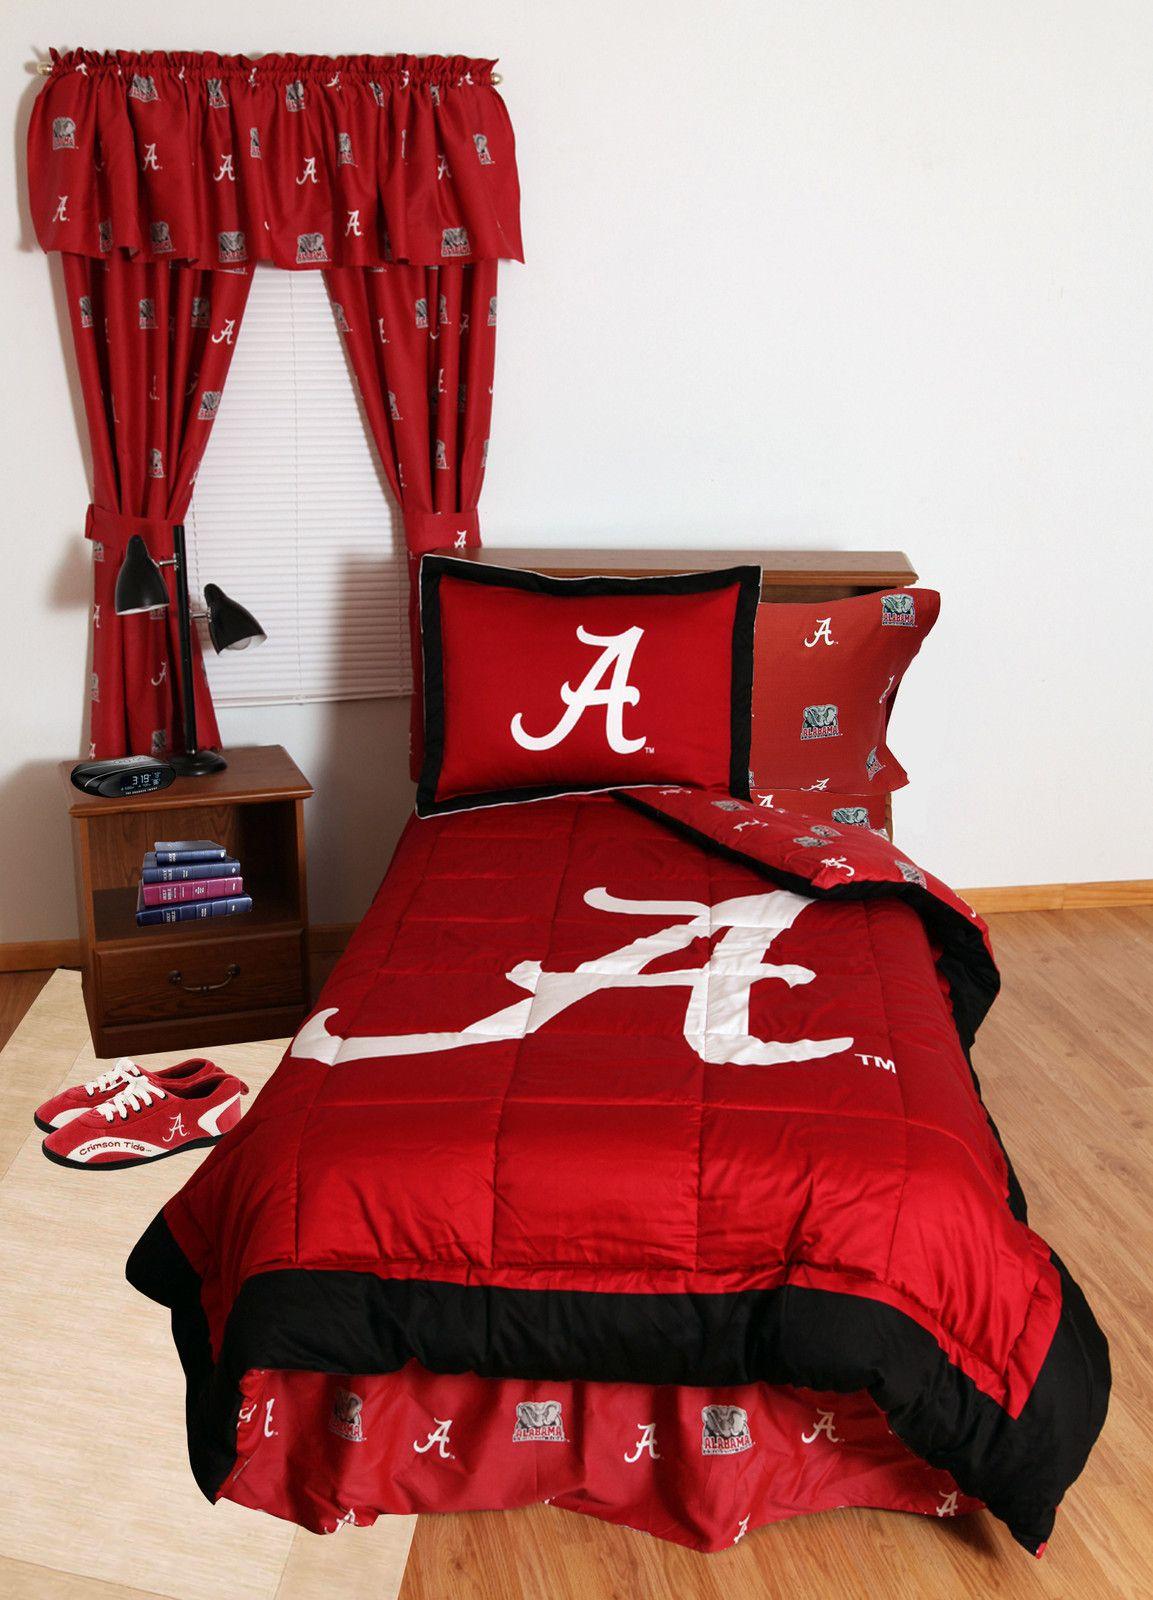 ALABAMA CRIMSON TIDE BED IN BAG & CURATIN & VALANCE   WHITE OR TEAM